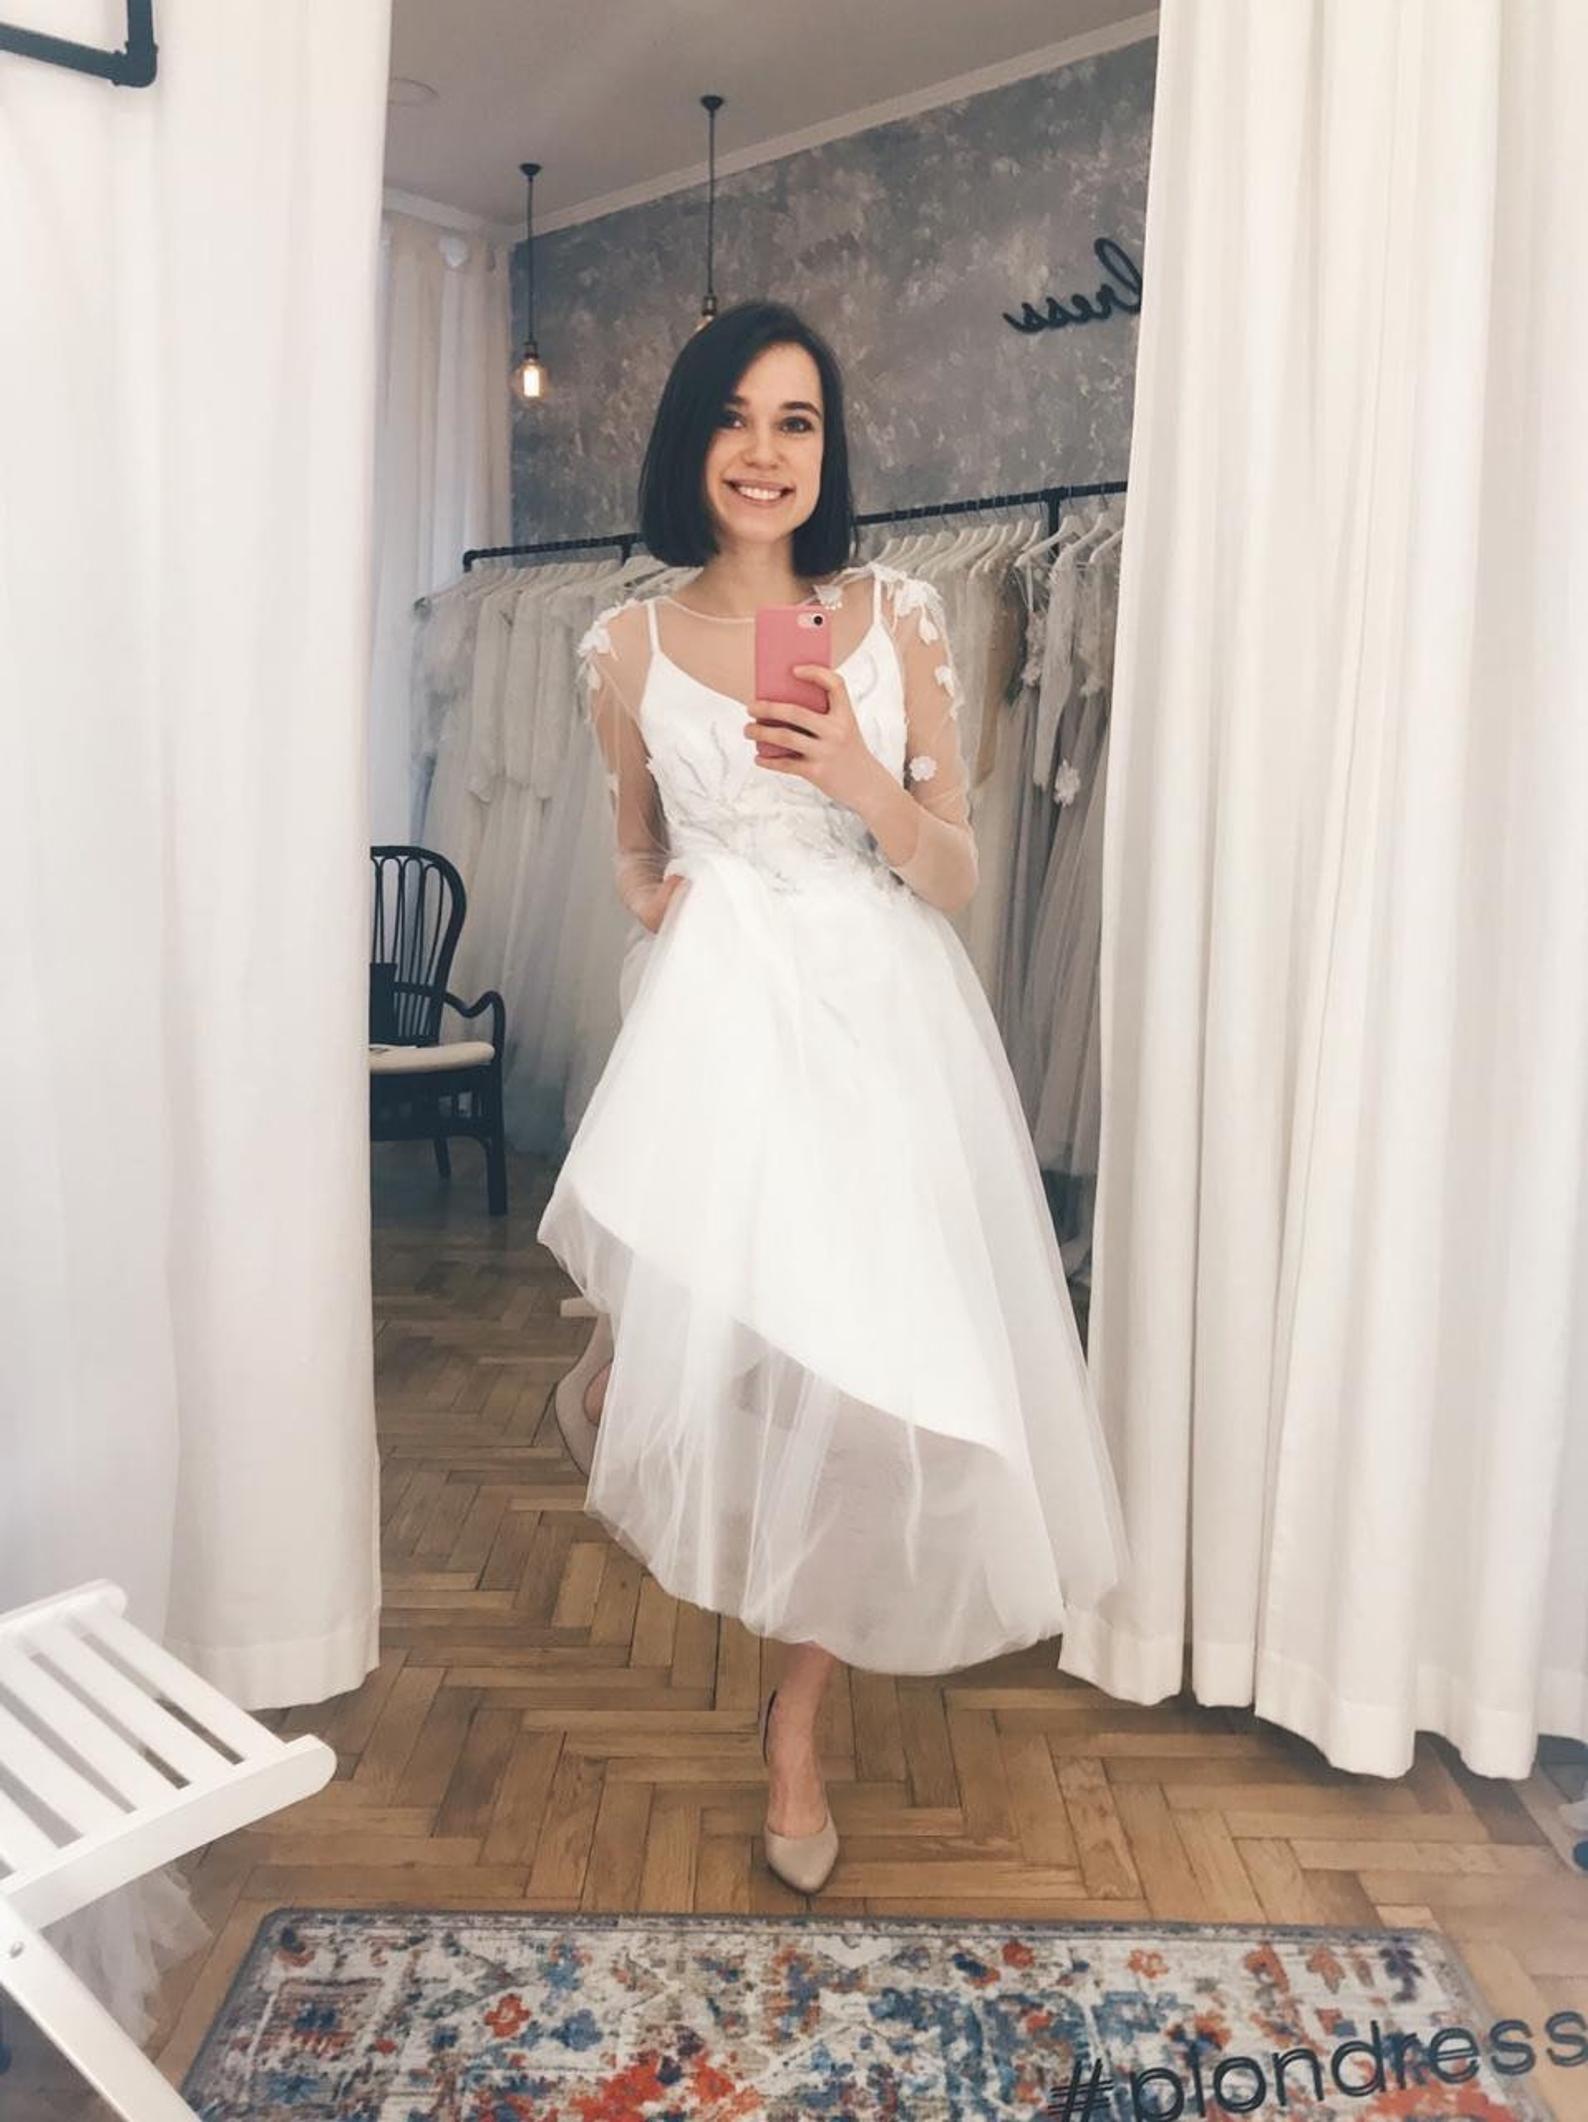 Short Wedding Dress Long Sleeve Tulle Wedding Dress Wedding Etsy Midi Wedding Dress Wedding Dress Long Sleeve Tulle Wedding Dress [ 2122 x 1588 Pixel ]